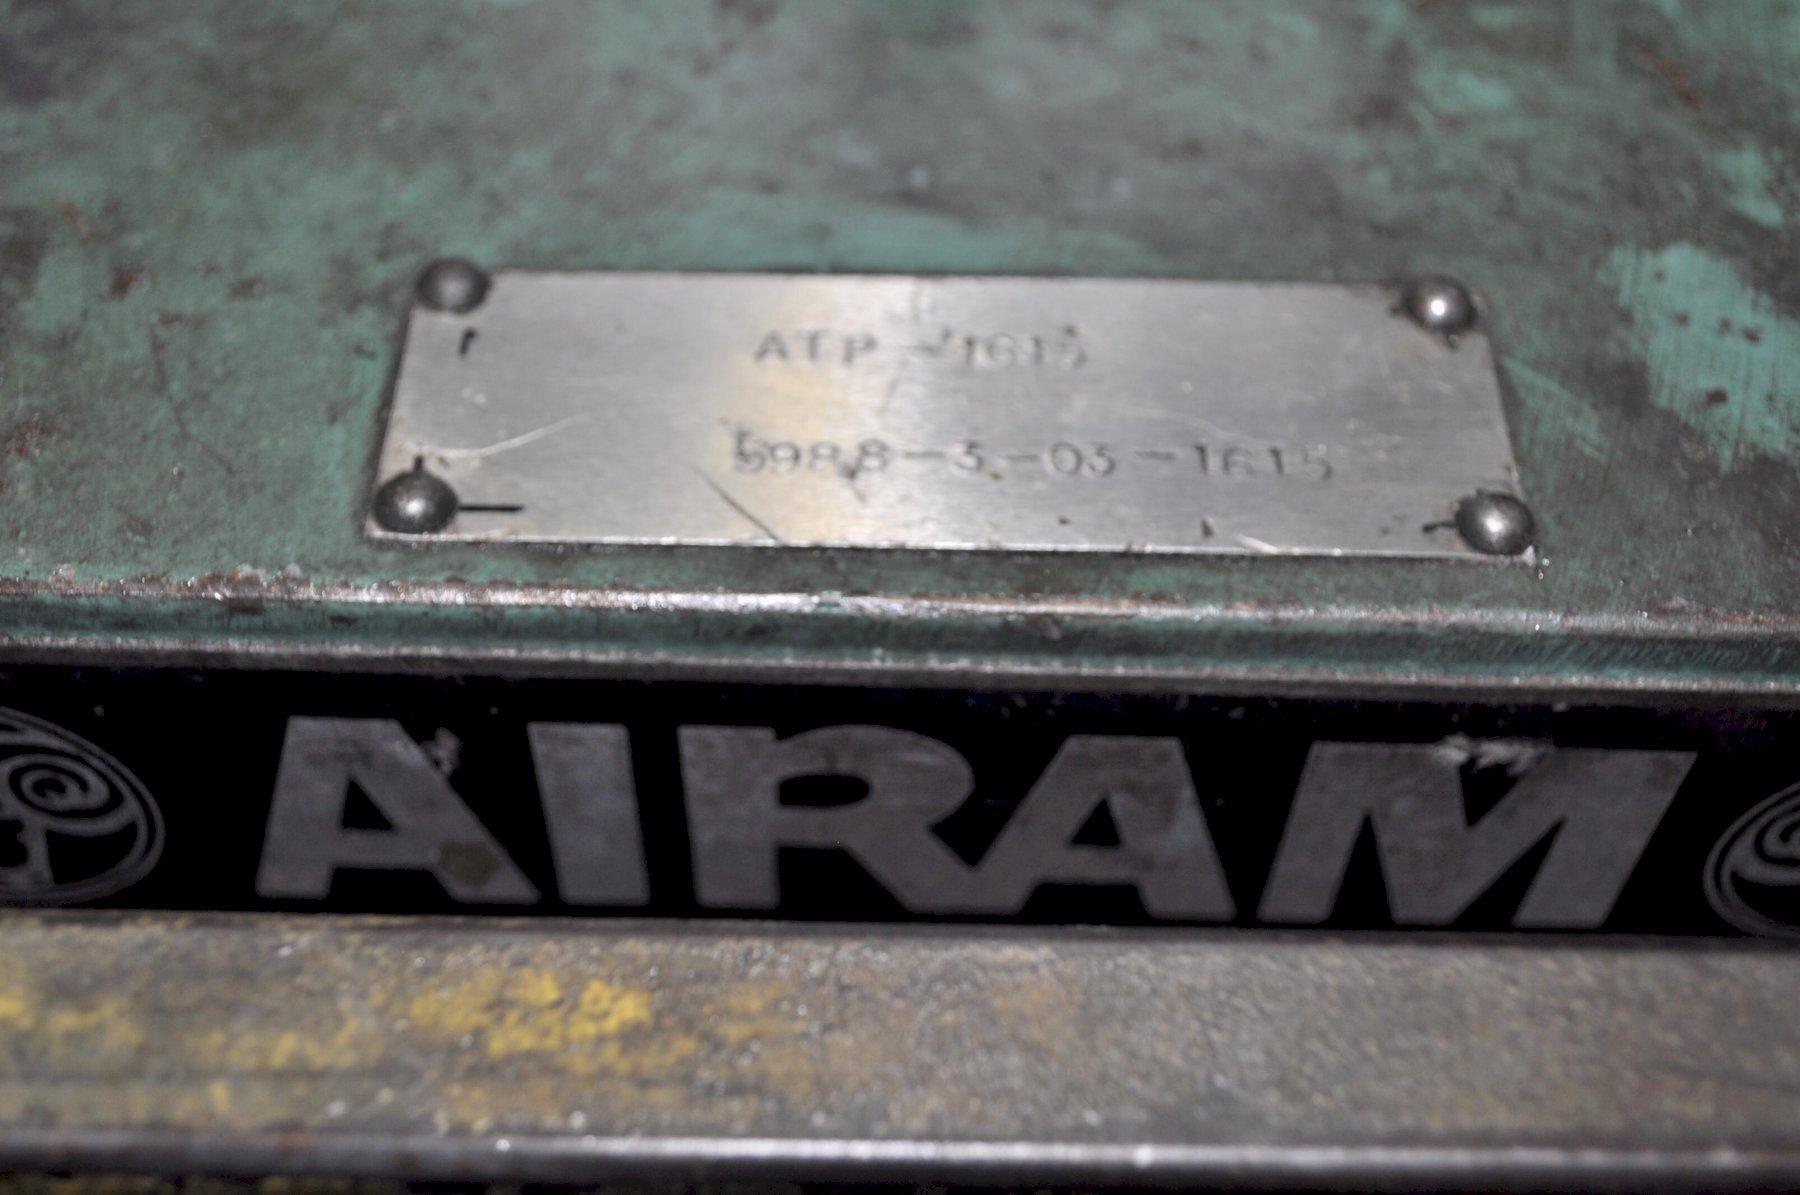 60 TON AIR RAM CUT-OFF PRESS WITH ADJUSTABLE TILT BASE